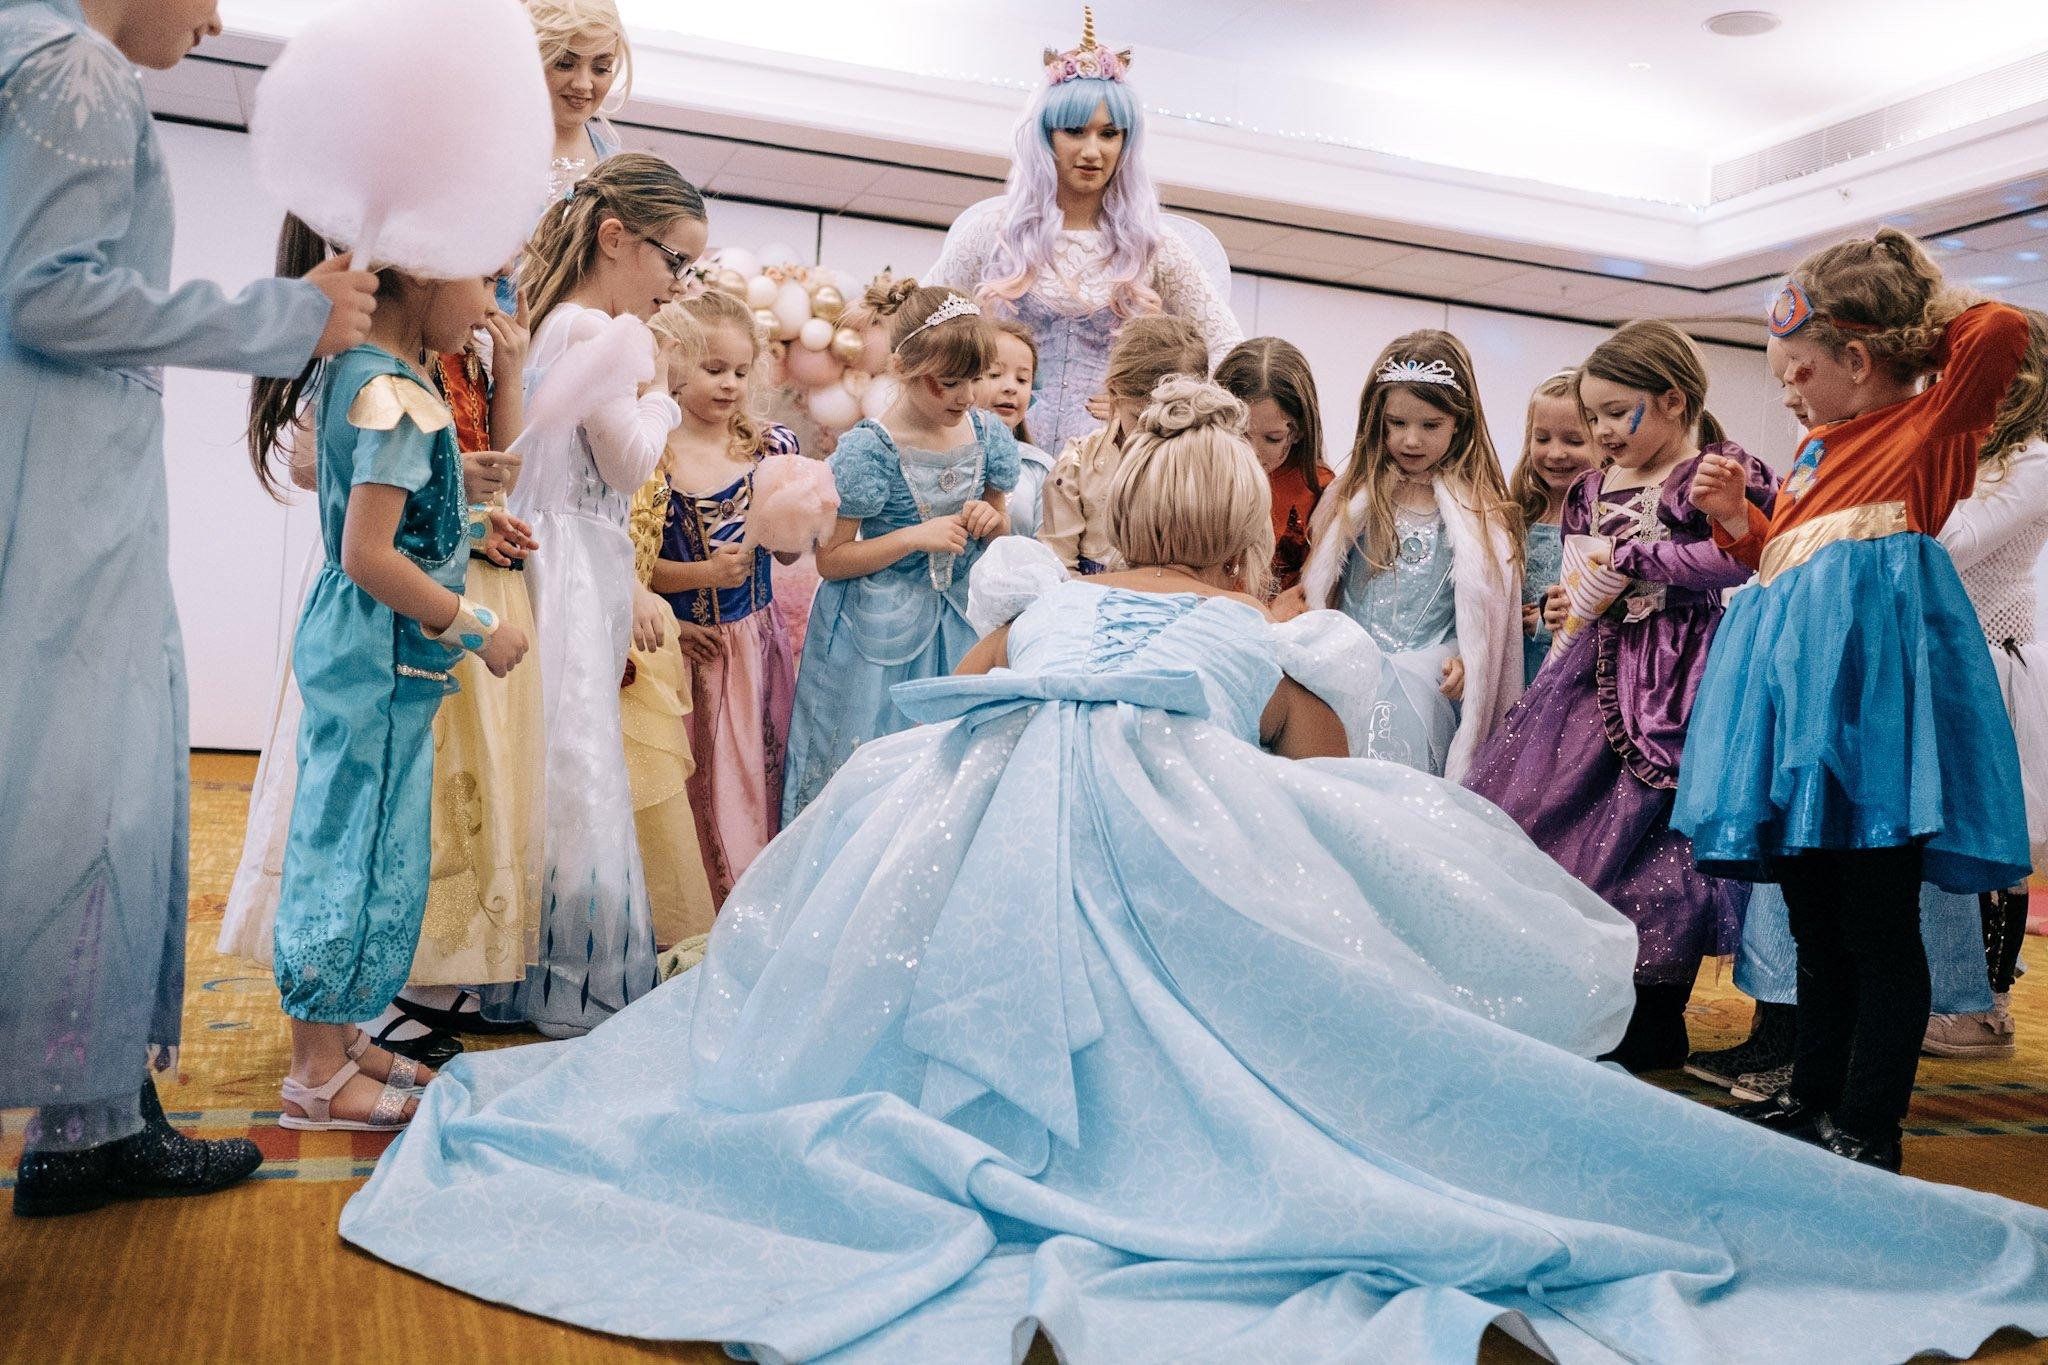 Princess party singing and dancing kent